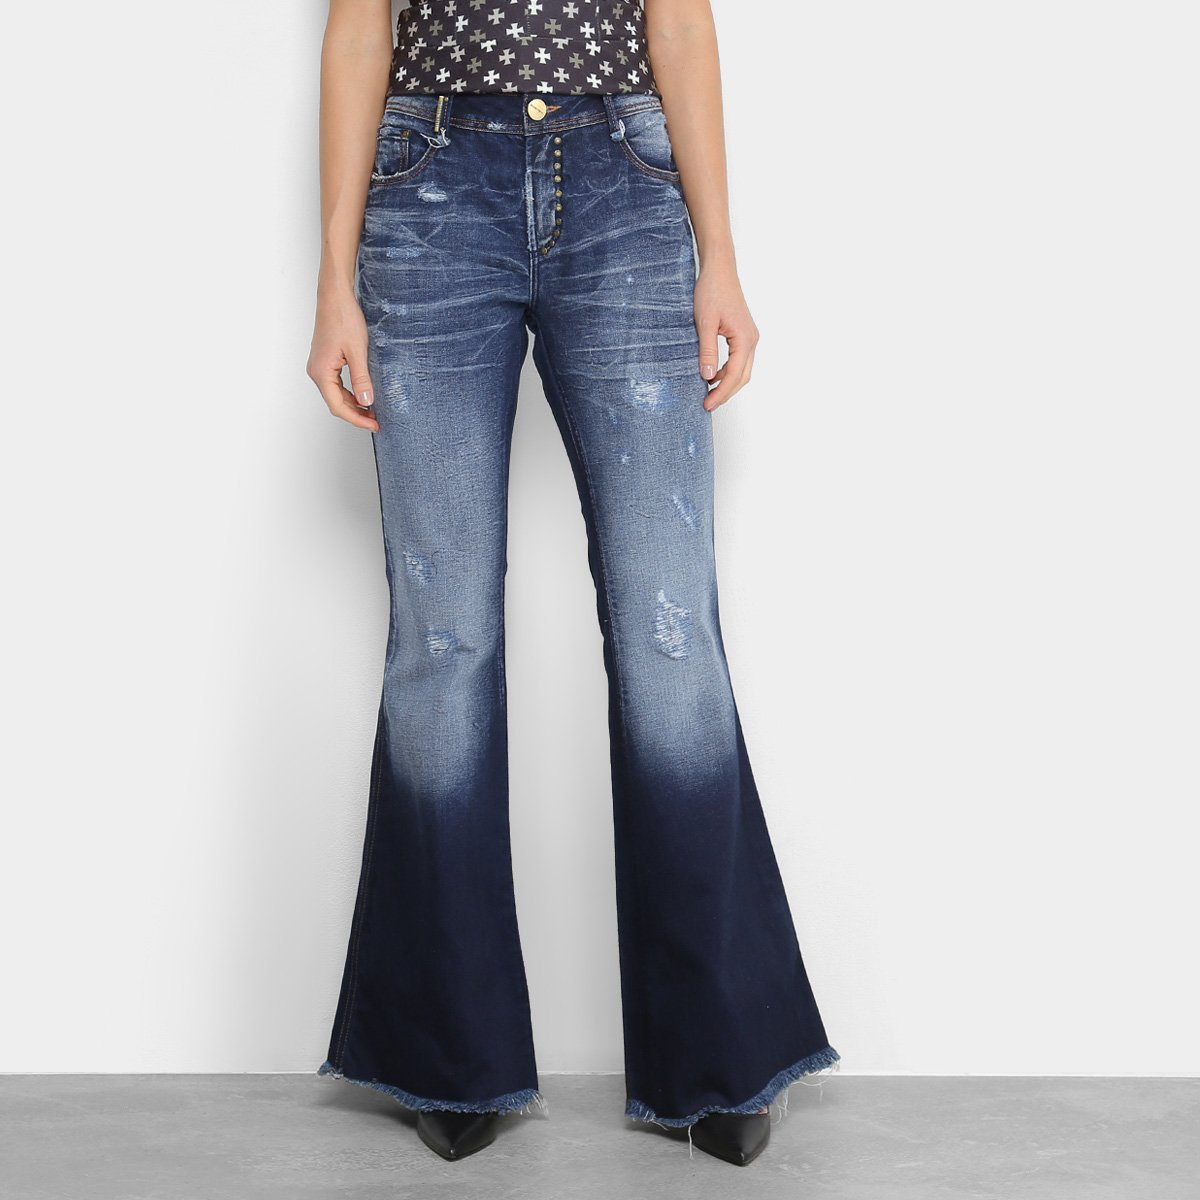 e70cfa1a2 Calça Jeans Flare Lança Perfume Low Comfort Estonada Puídos Barra Des.